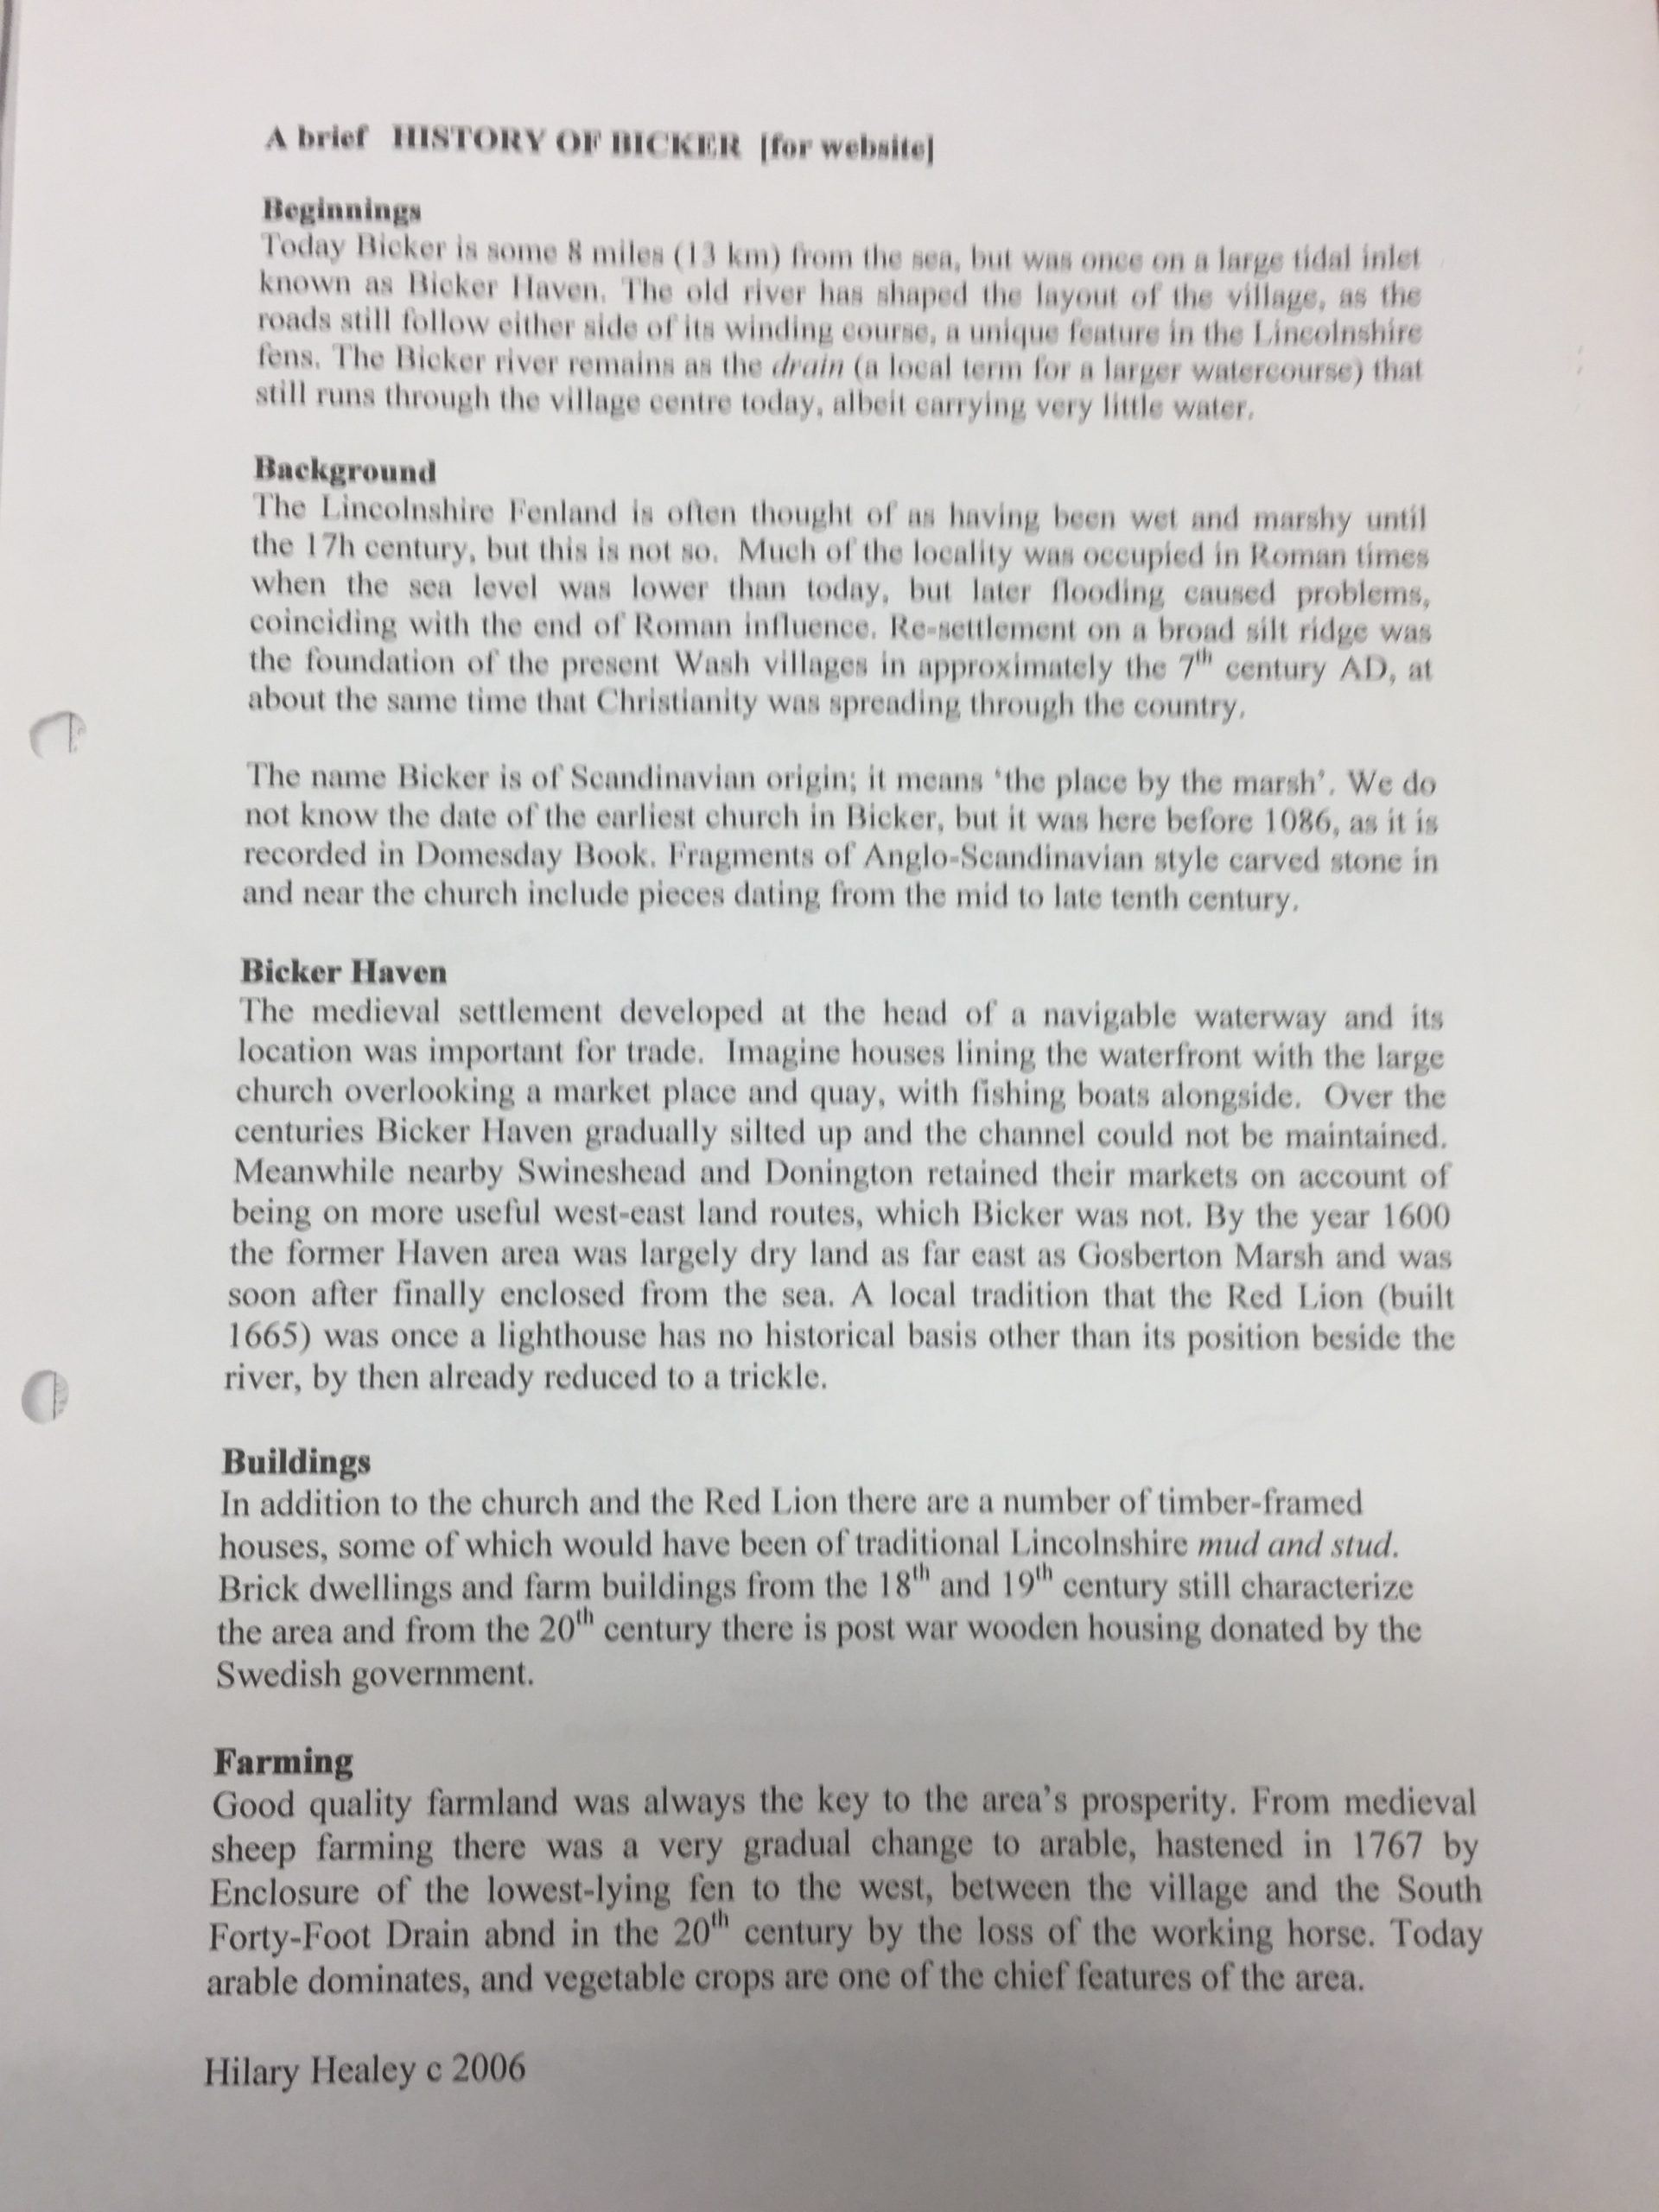 HH Bicker - a brief history